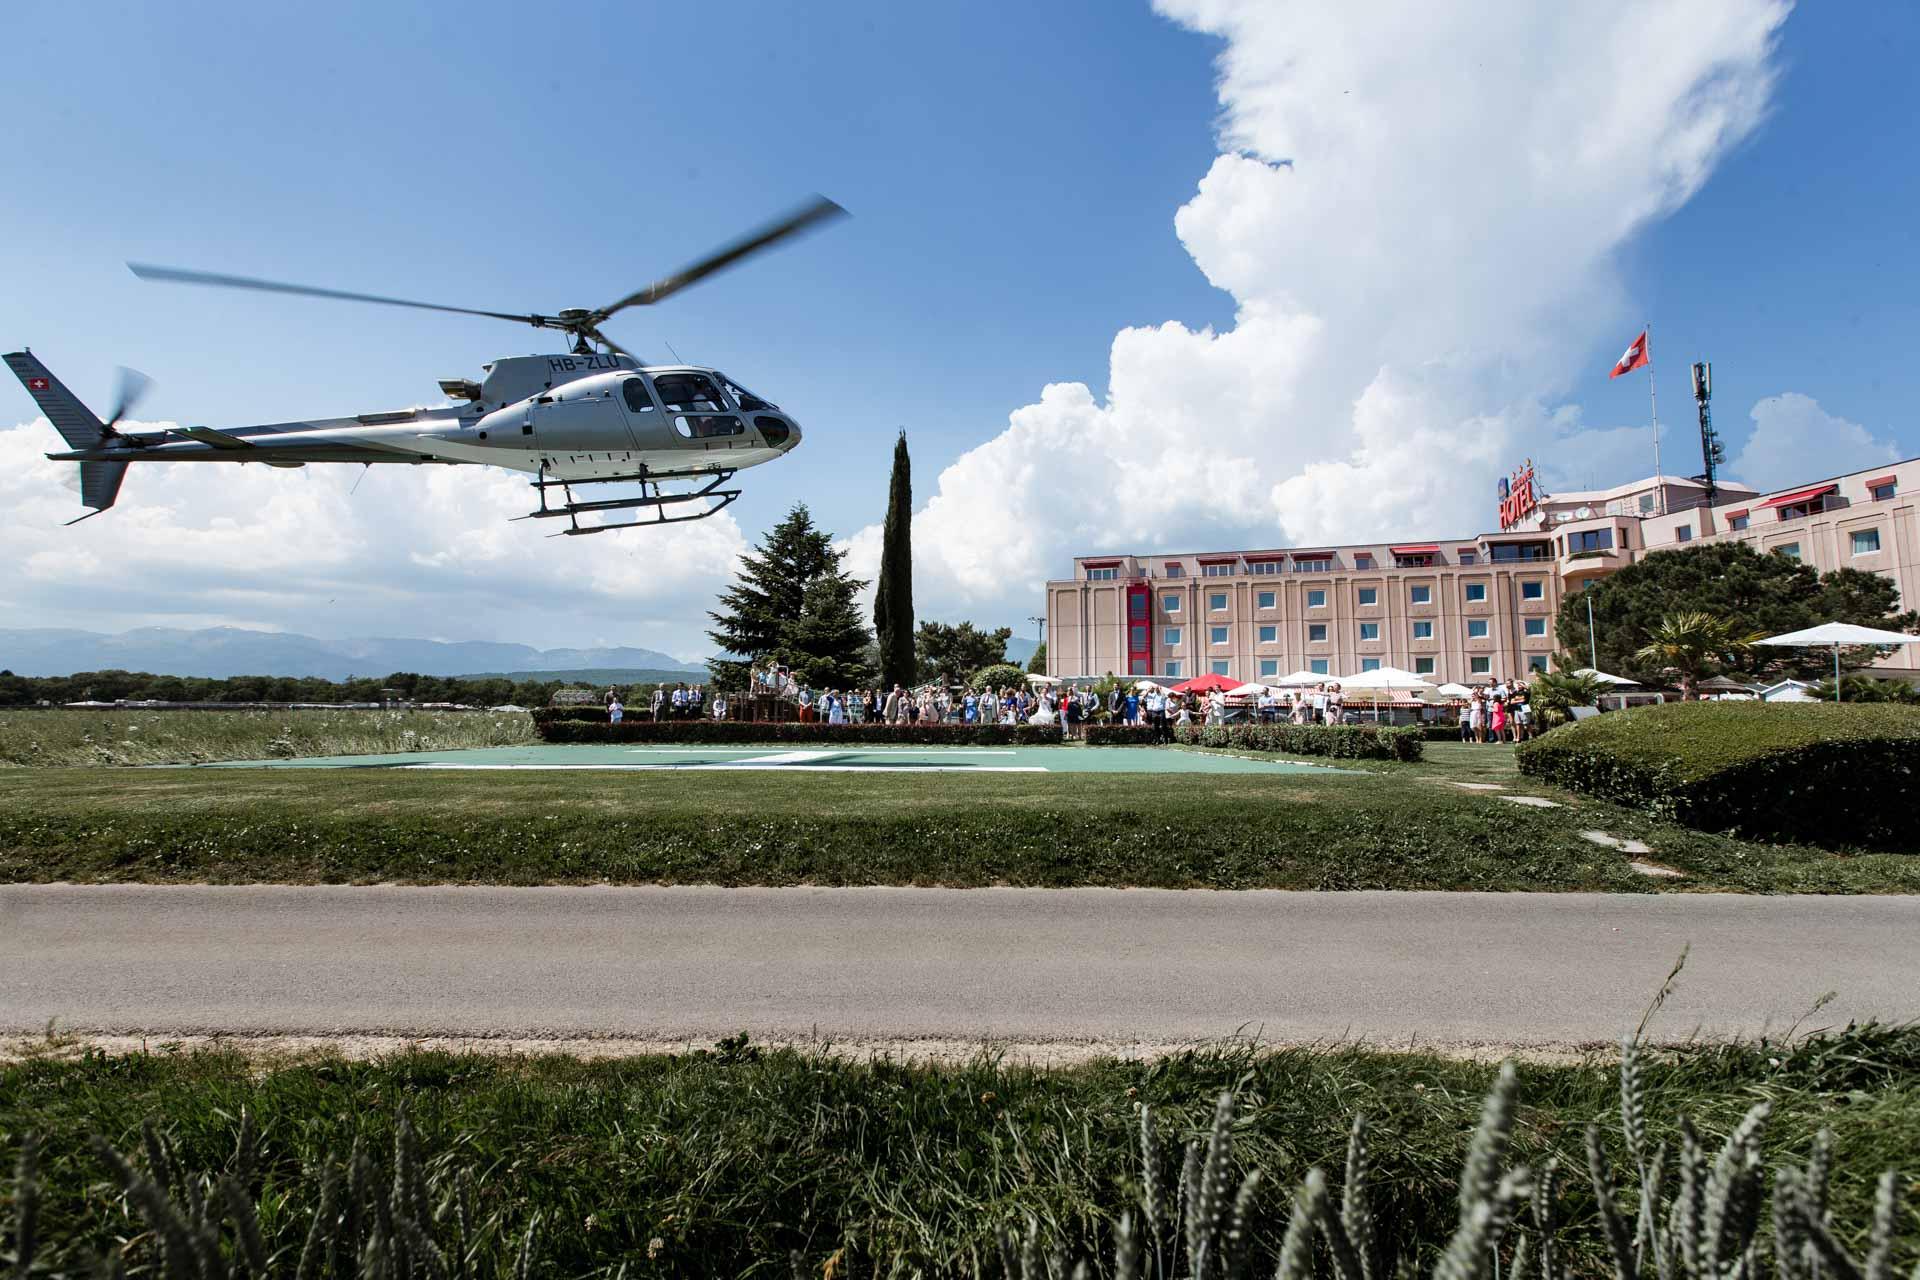 Mariage Helicoptere Chavannes Best Western en vol